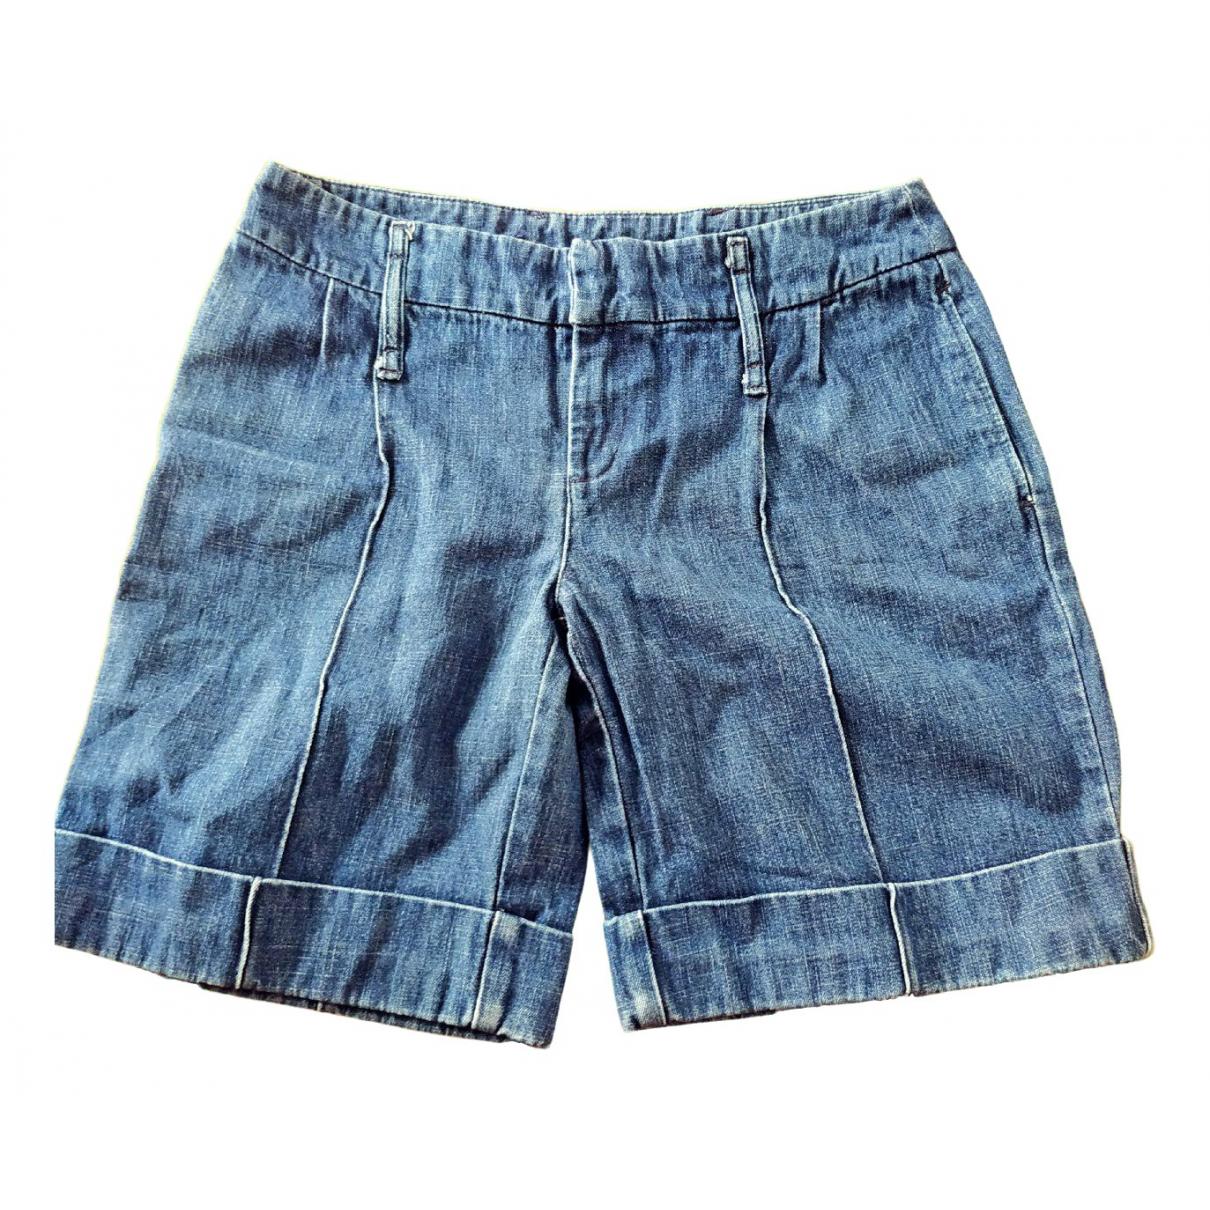 Max & Co \N Blue Cotton Shorts for Men 40 FR